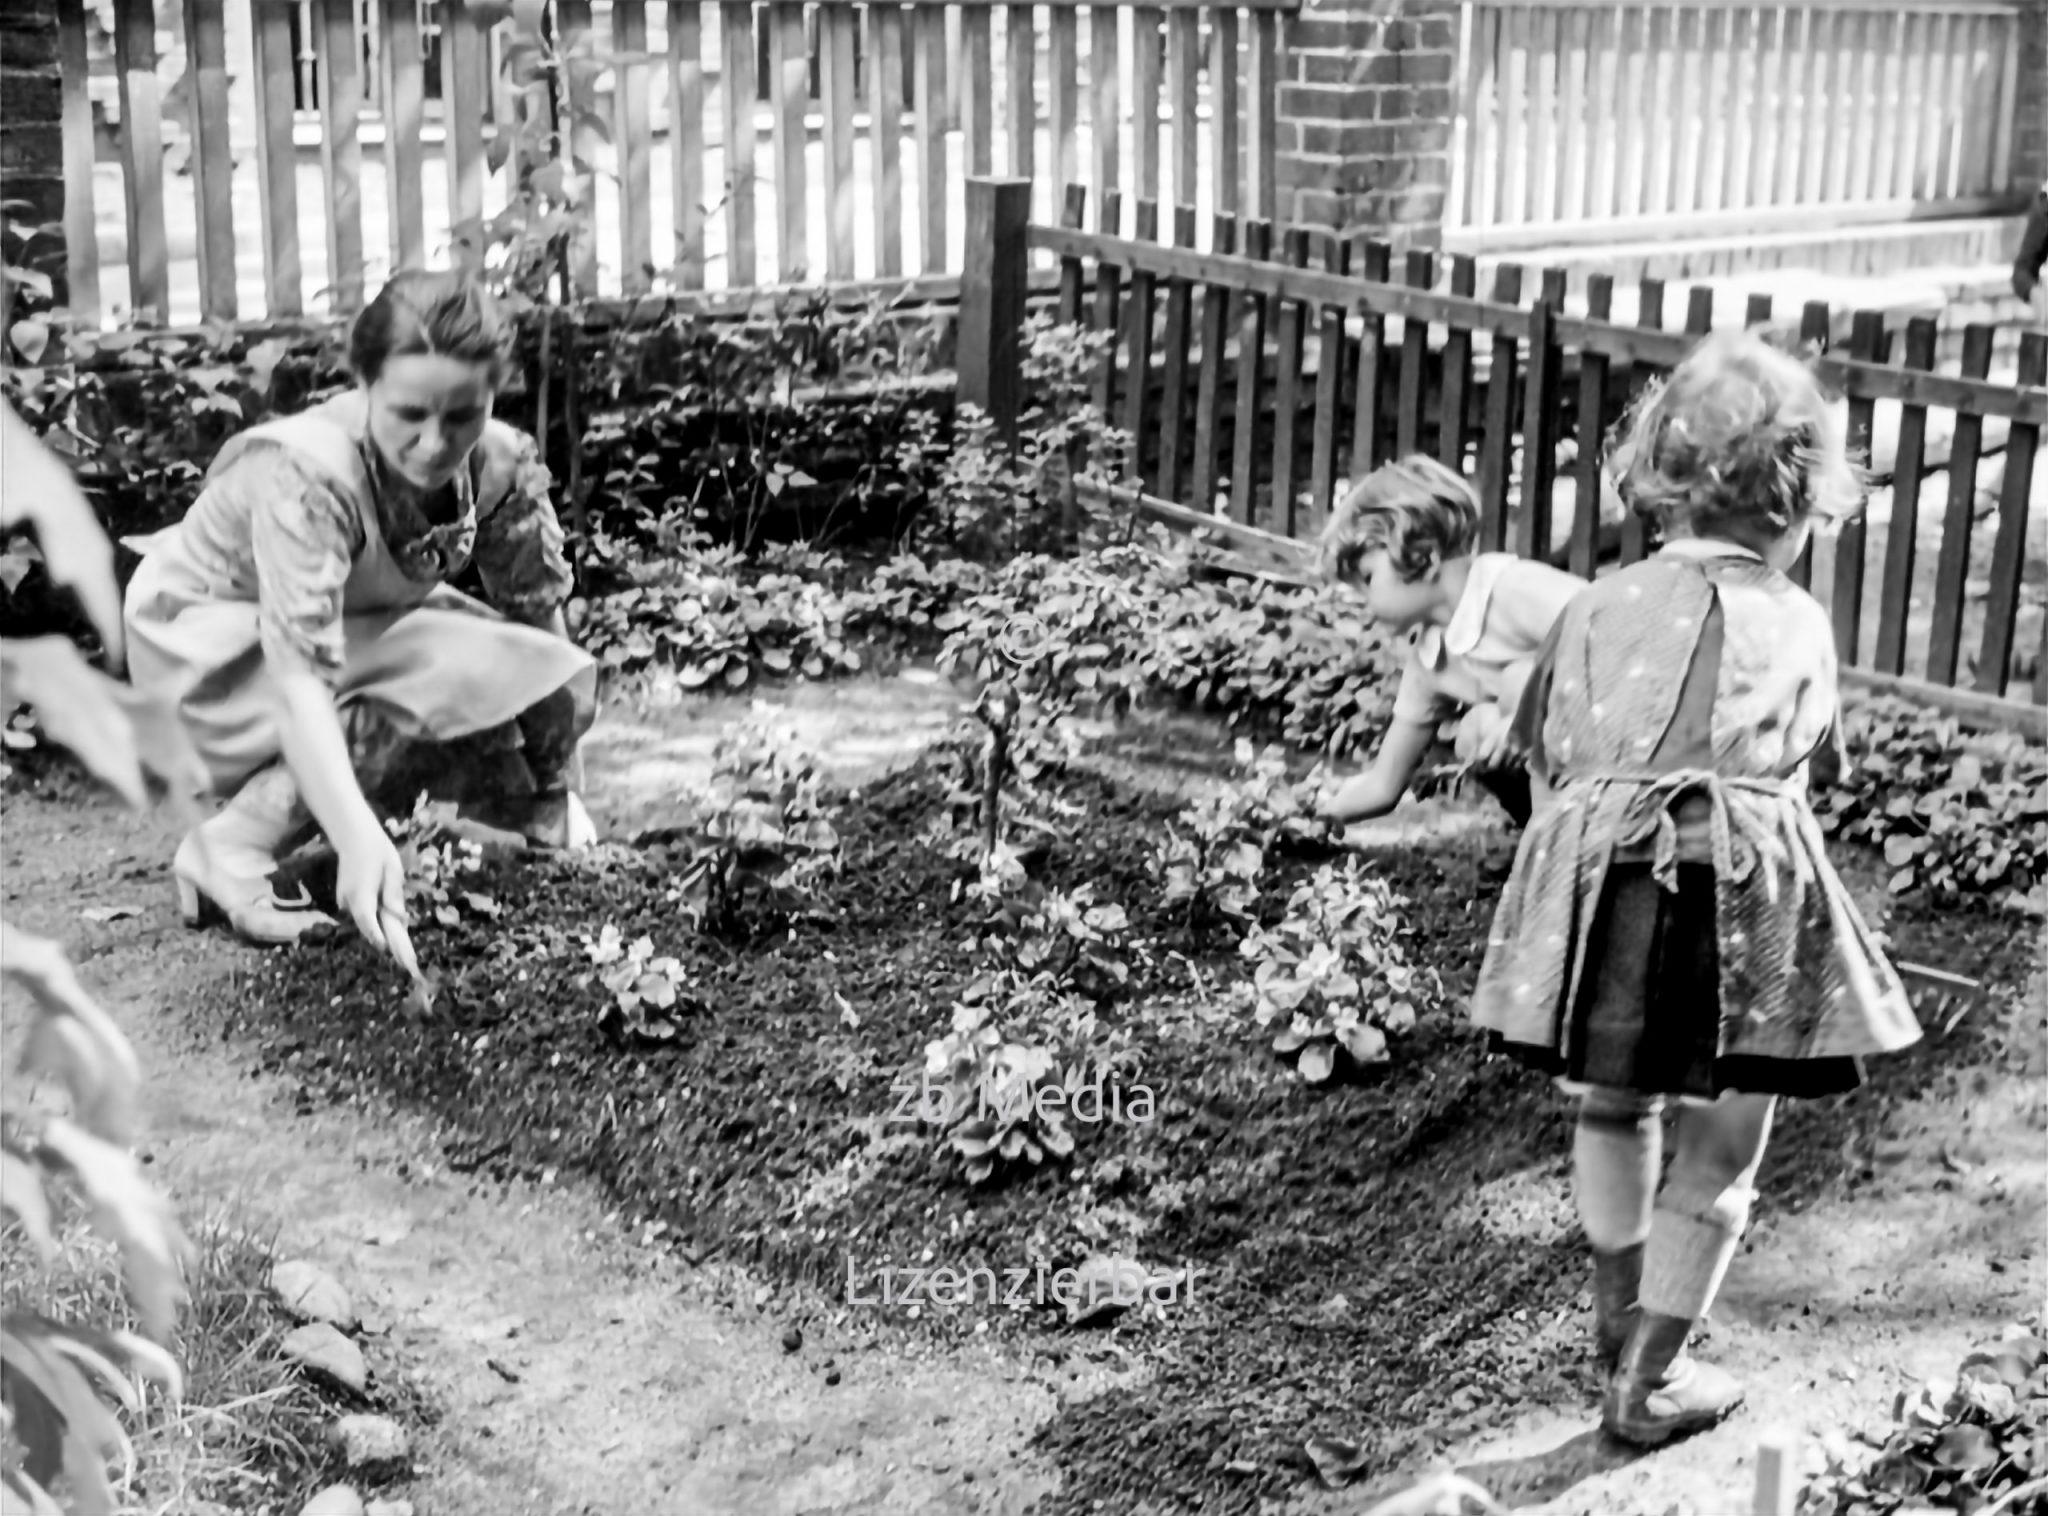 Kinder im Garten des Pestalozzi-Fröbel-Haus Berlin 1937